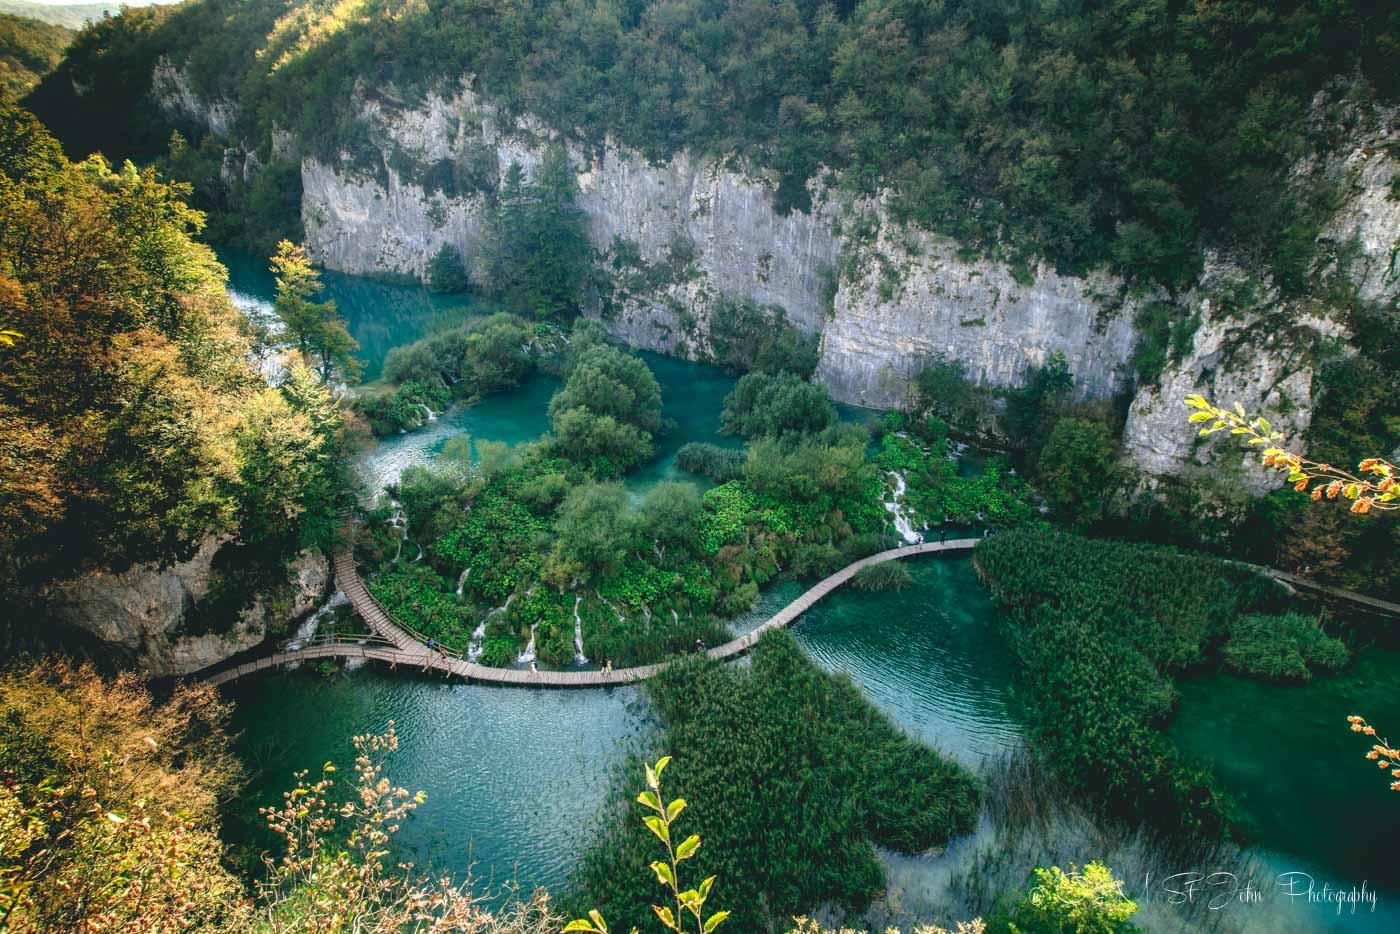 Plitvice Lakes National Park, Central Croatia